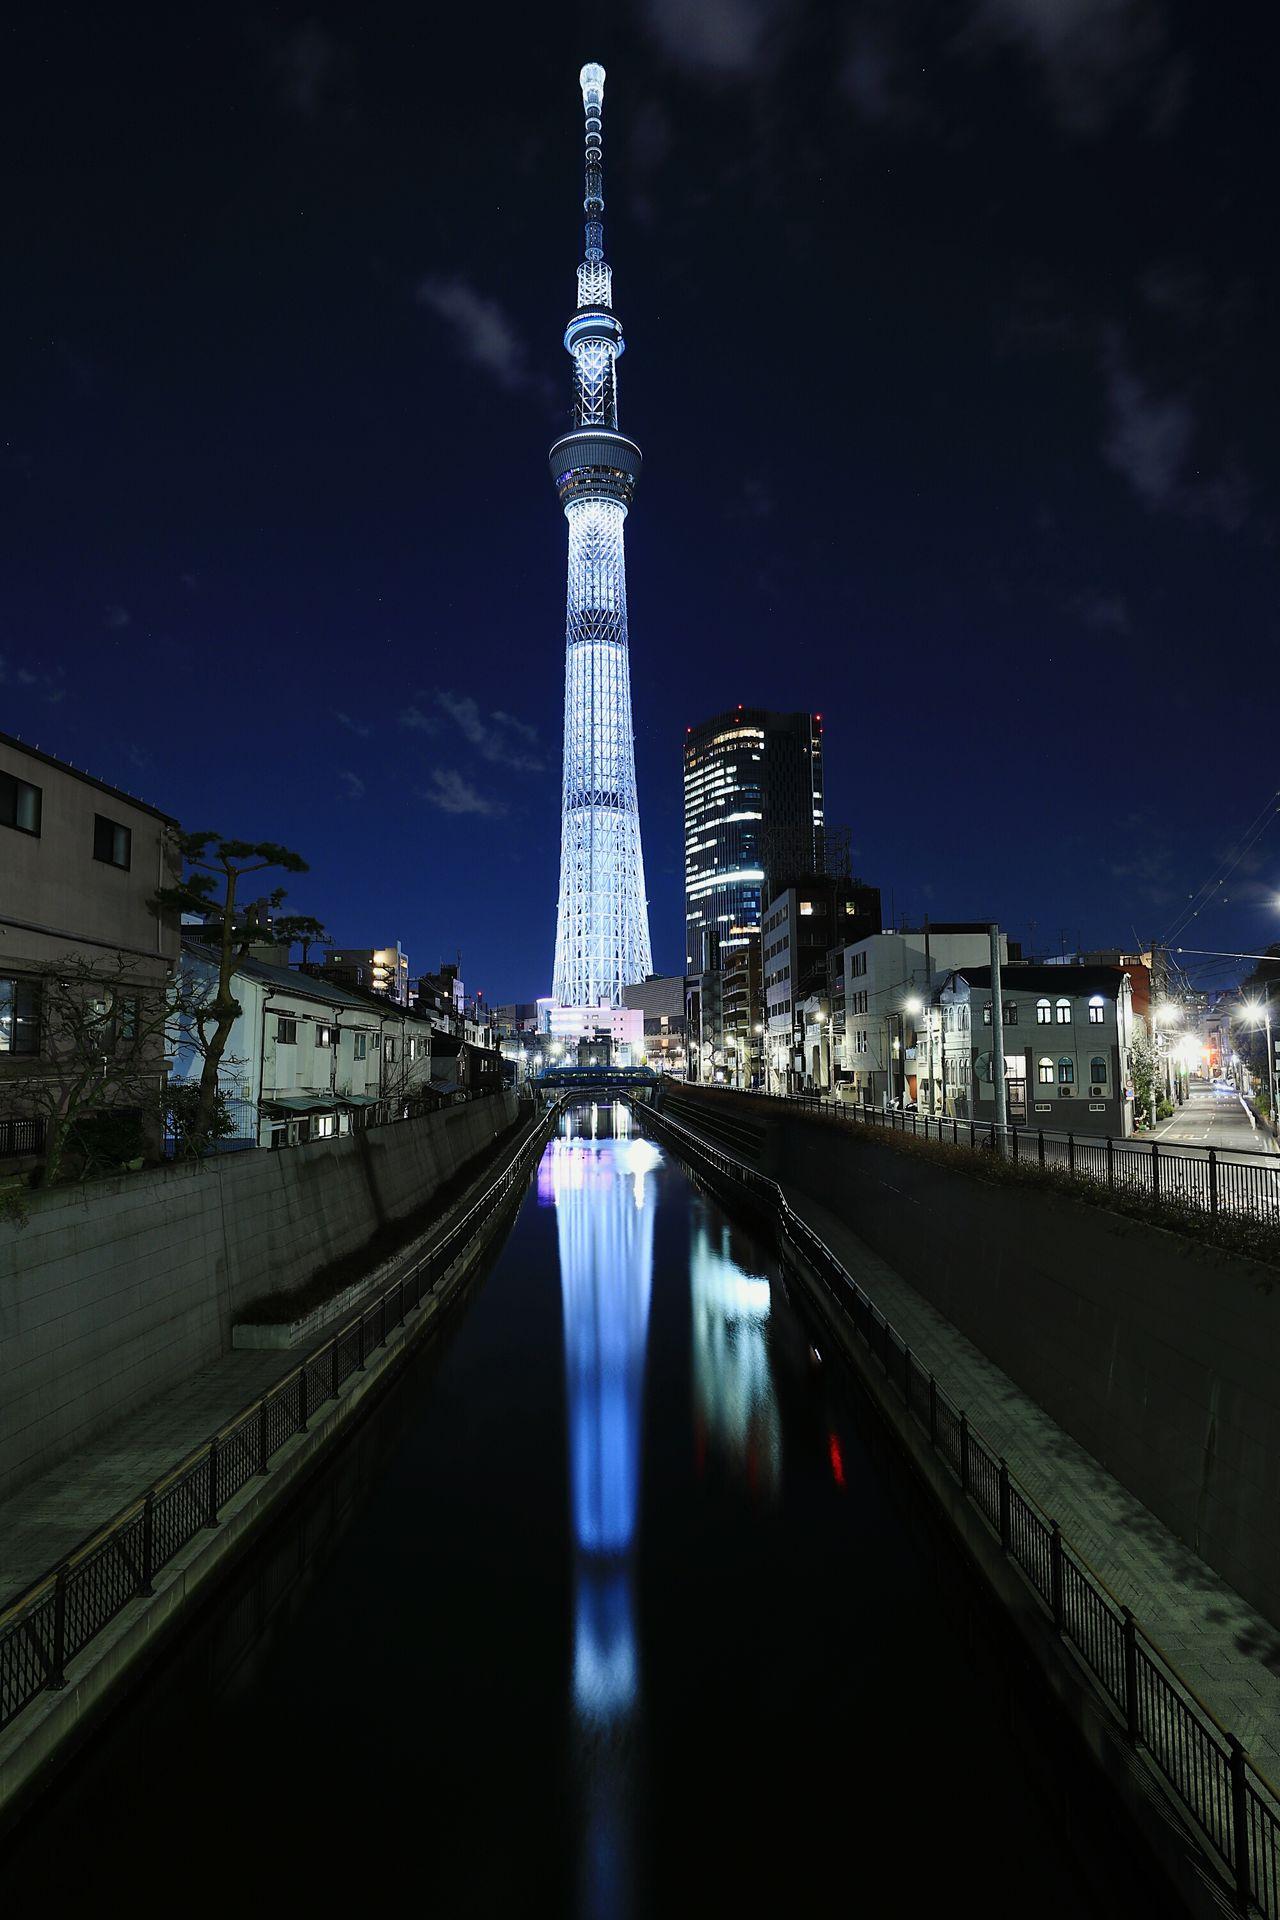 Night Reflection Tower Skyscraper Nightview Nightscape Nightphotography Illuminated Tokyo Japan Tokyoskytree Skytree Urban Landscape River Landscape